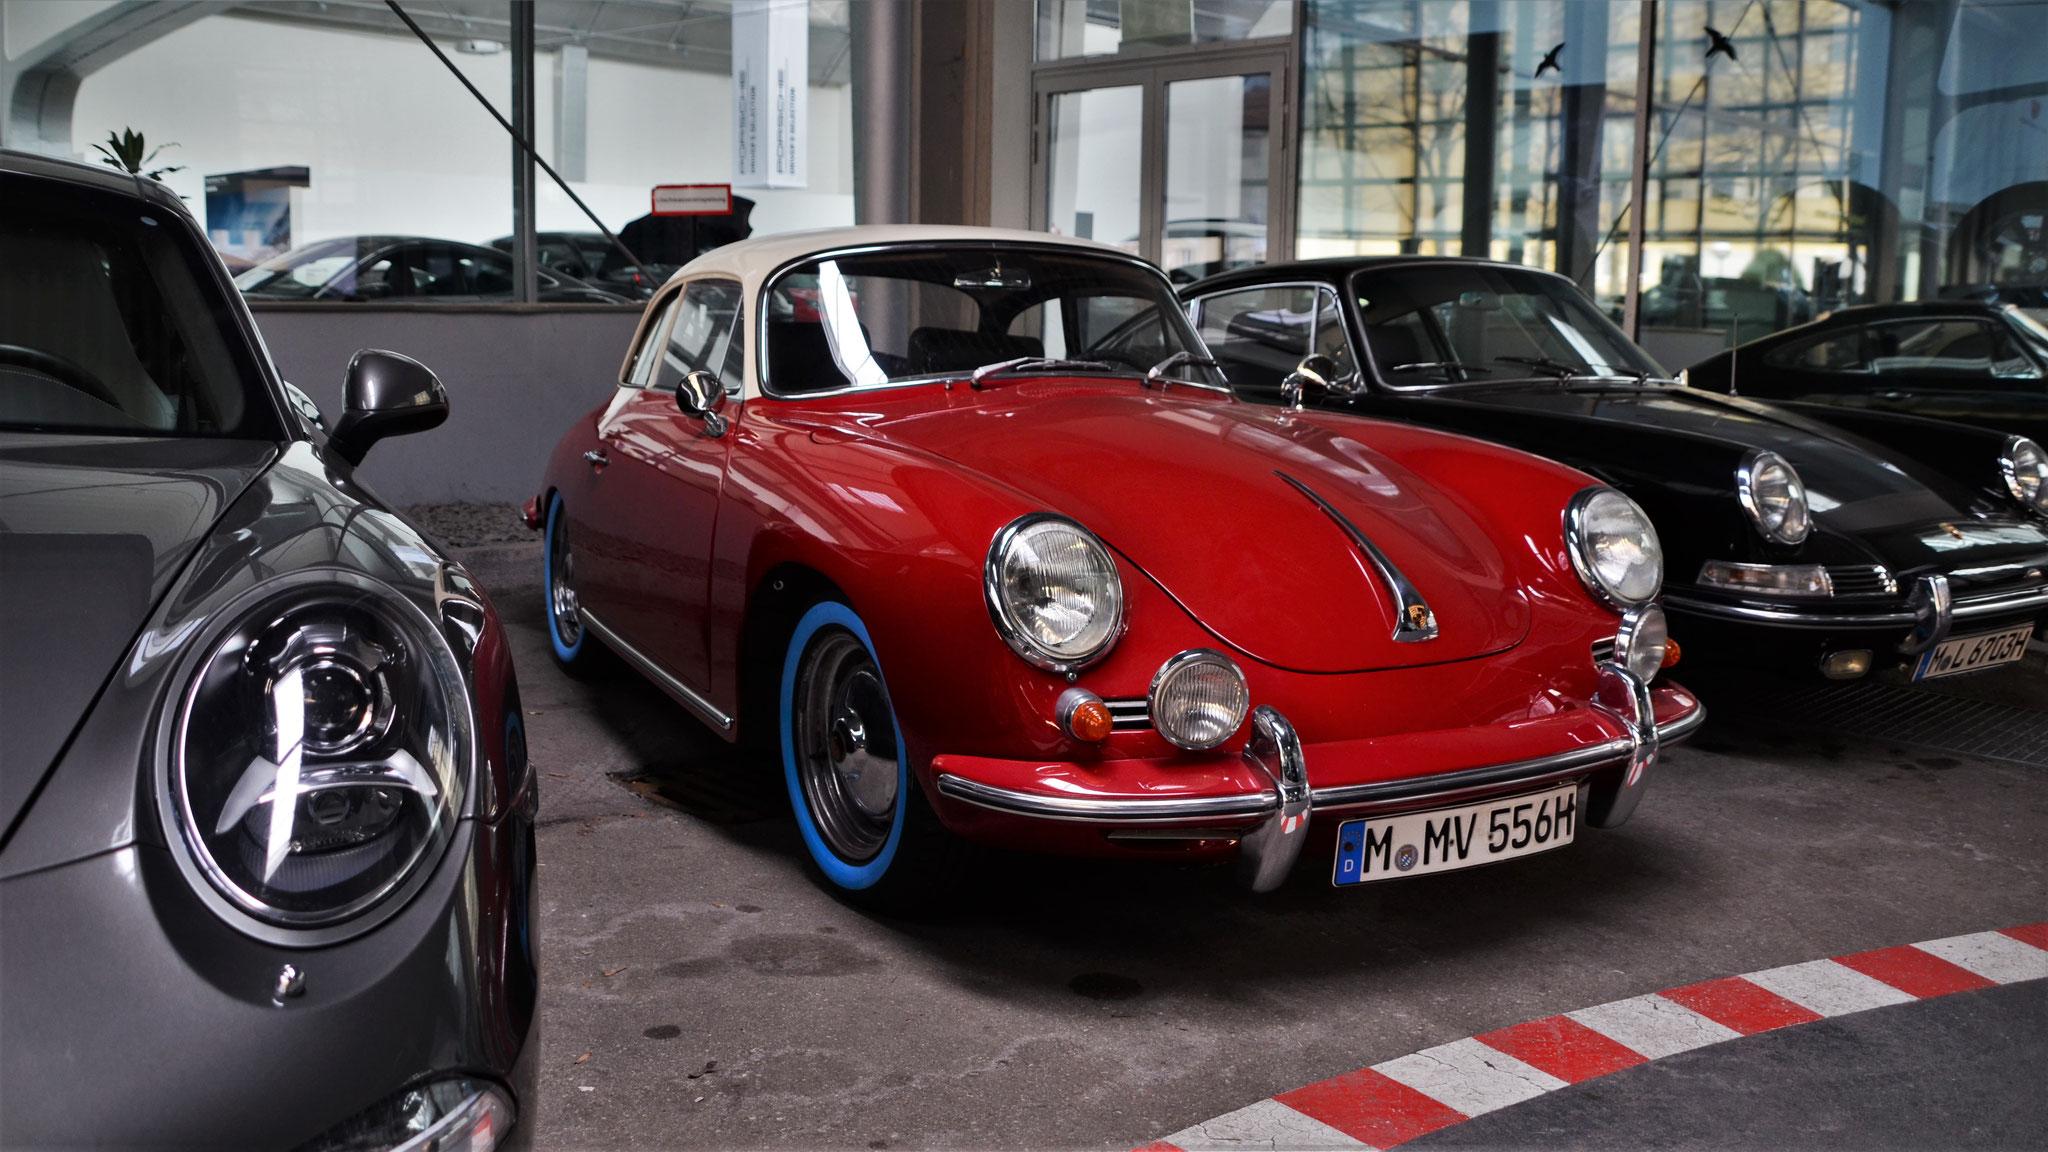 Porsche 356 S - M-MV-556H